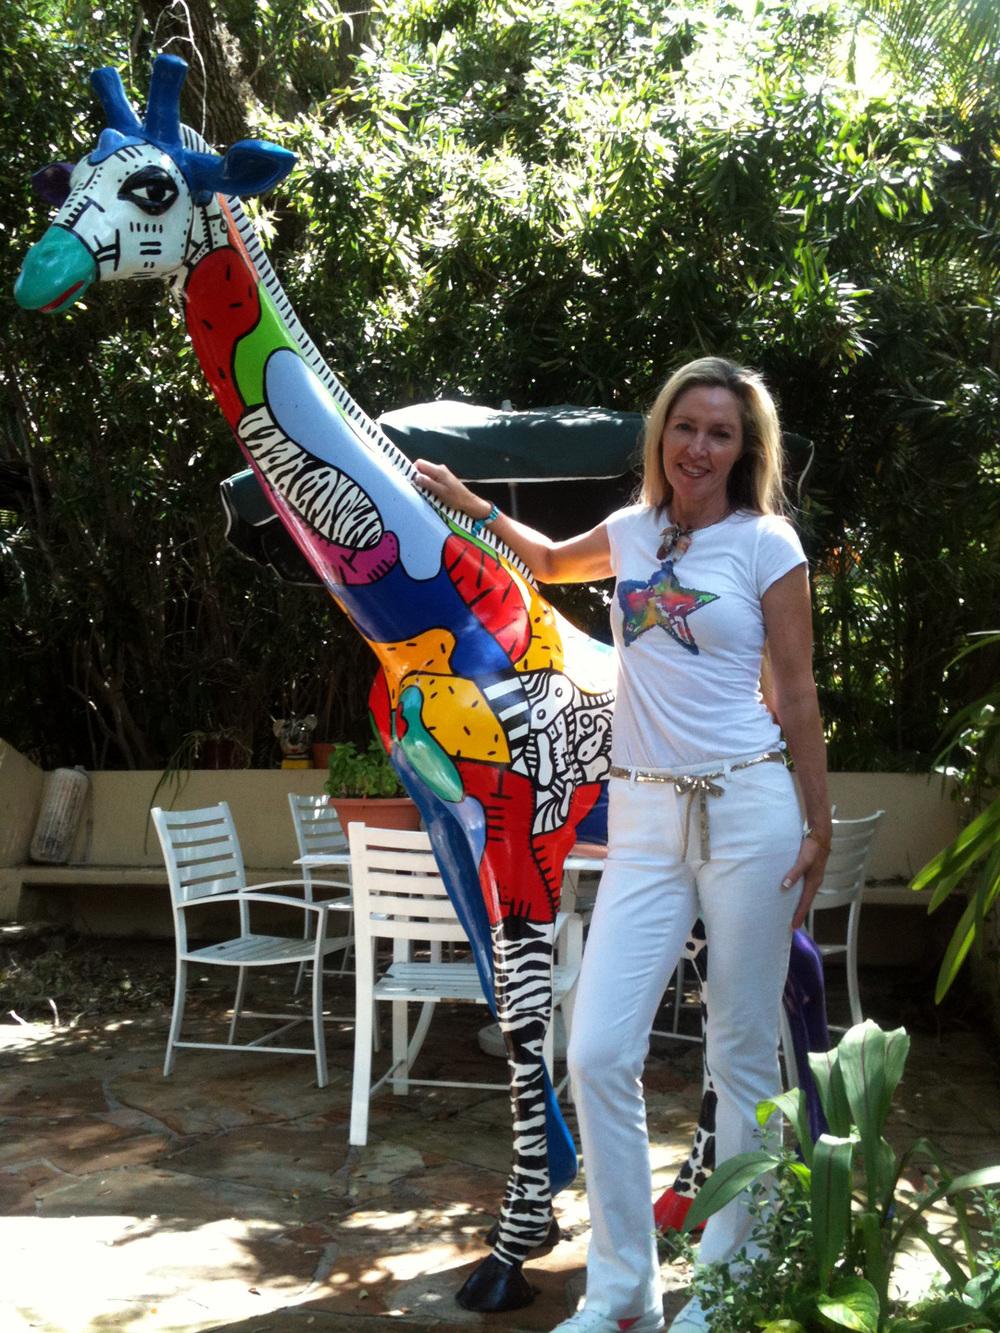 marcie ziv with giraffe 3 4 view.jpg